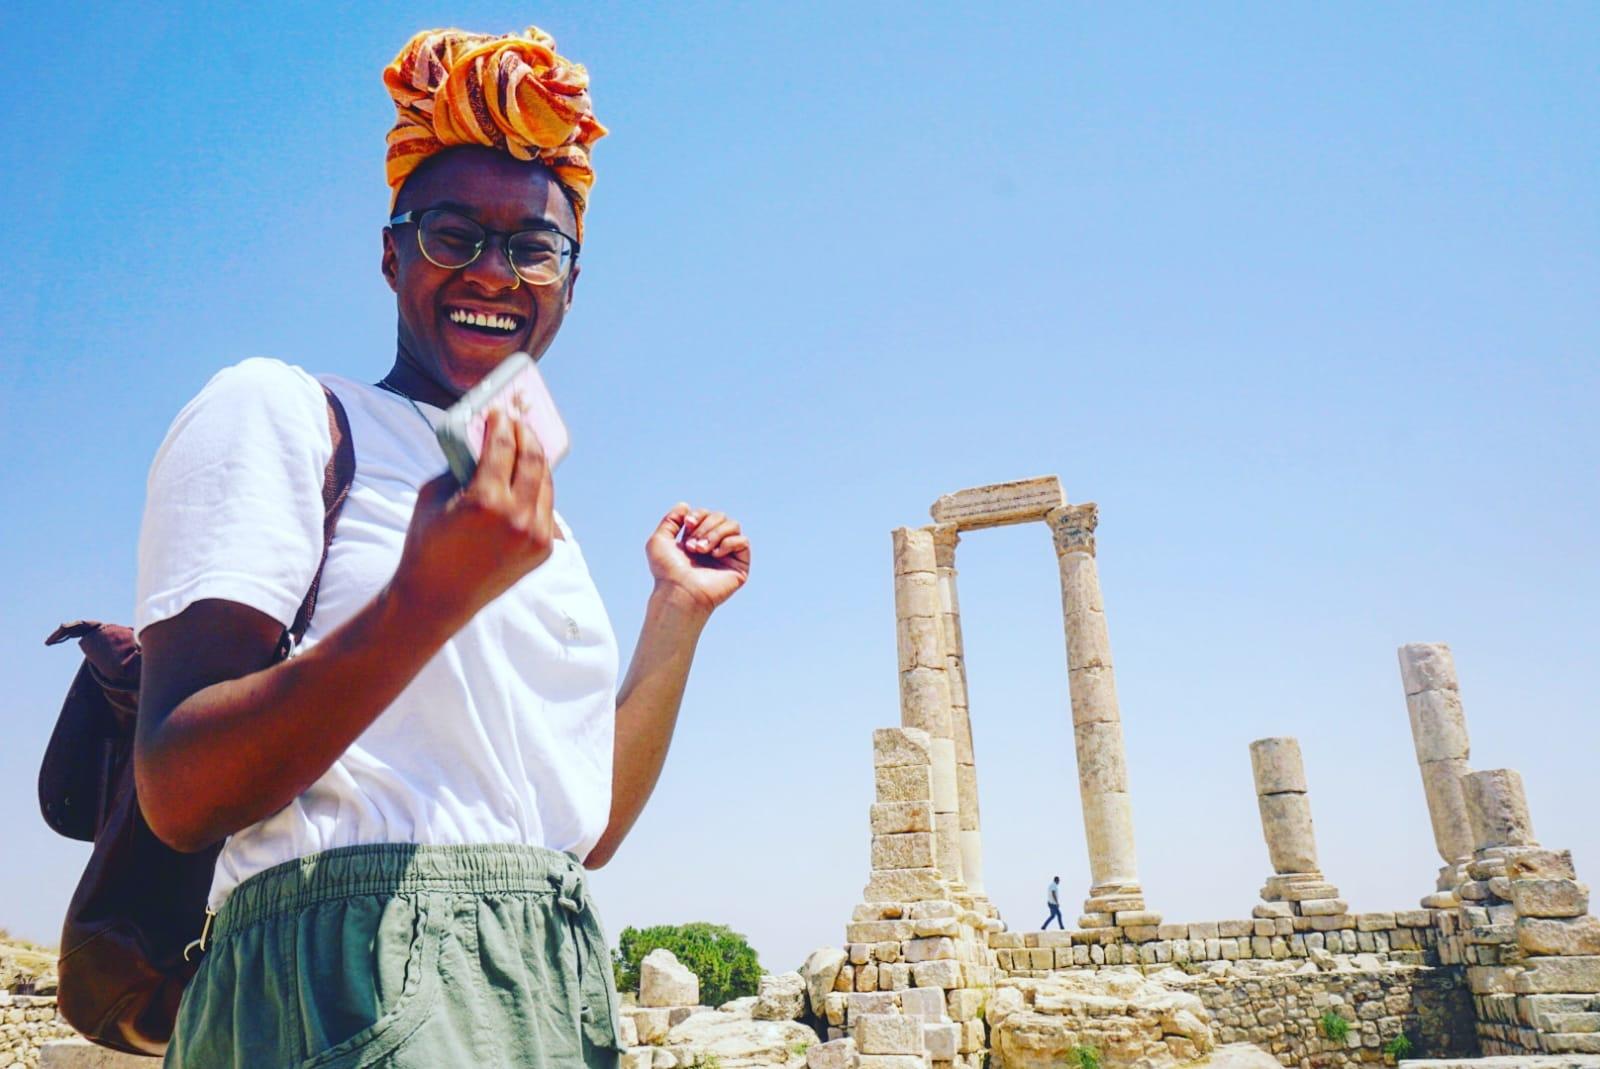 Gap at CET Jordan: Arabic Language & Internship Program